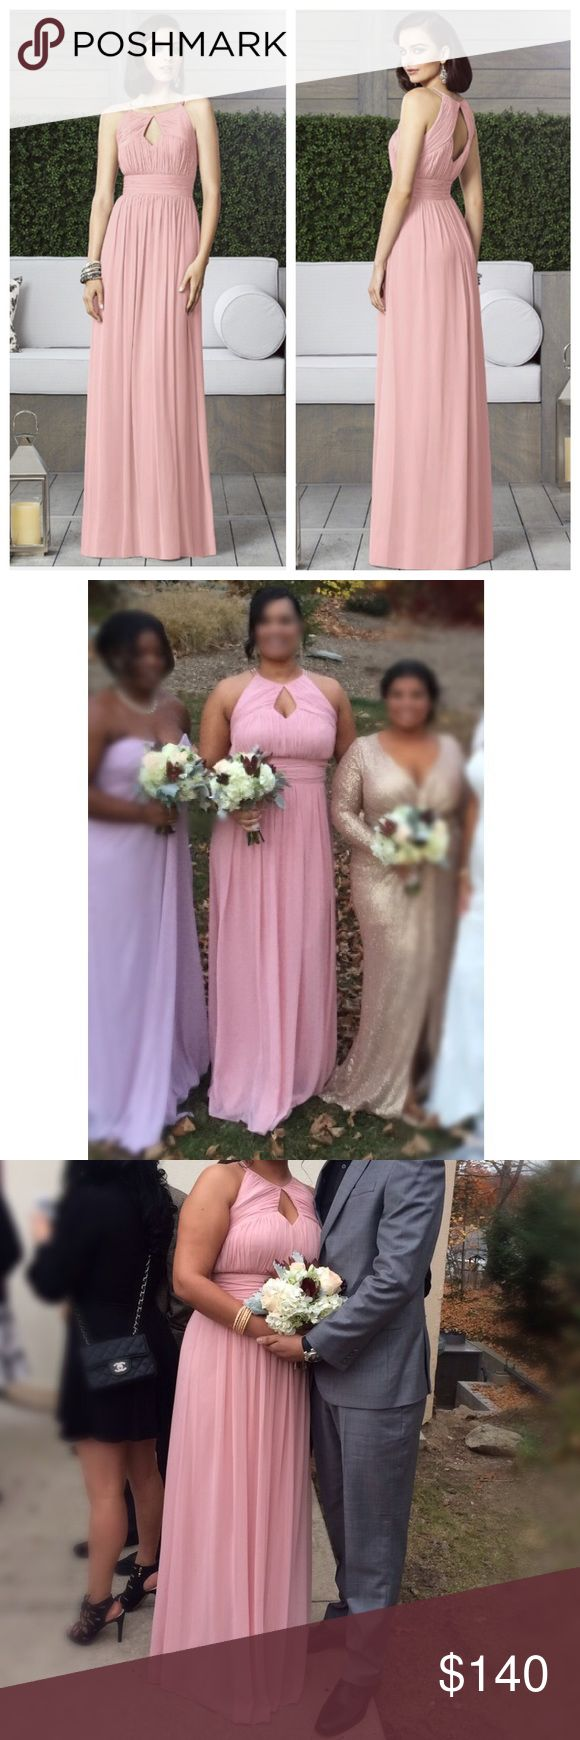 Best 25 dessy collection wedding dresses ideas on pinterest dessy bridesmaid dress ombrellifo Gallery